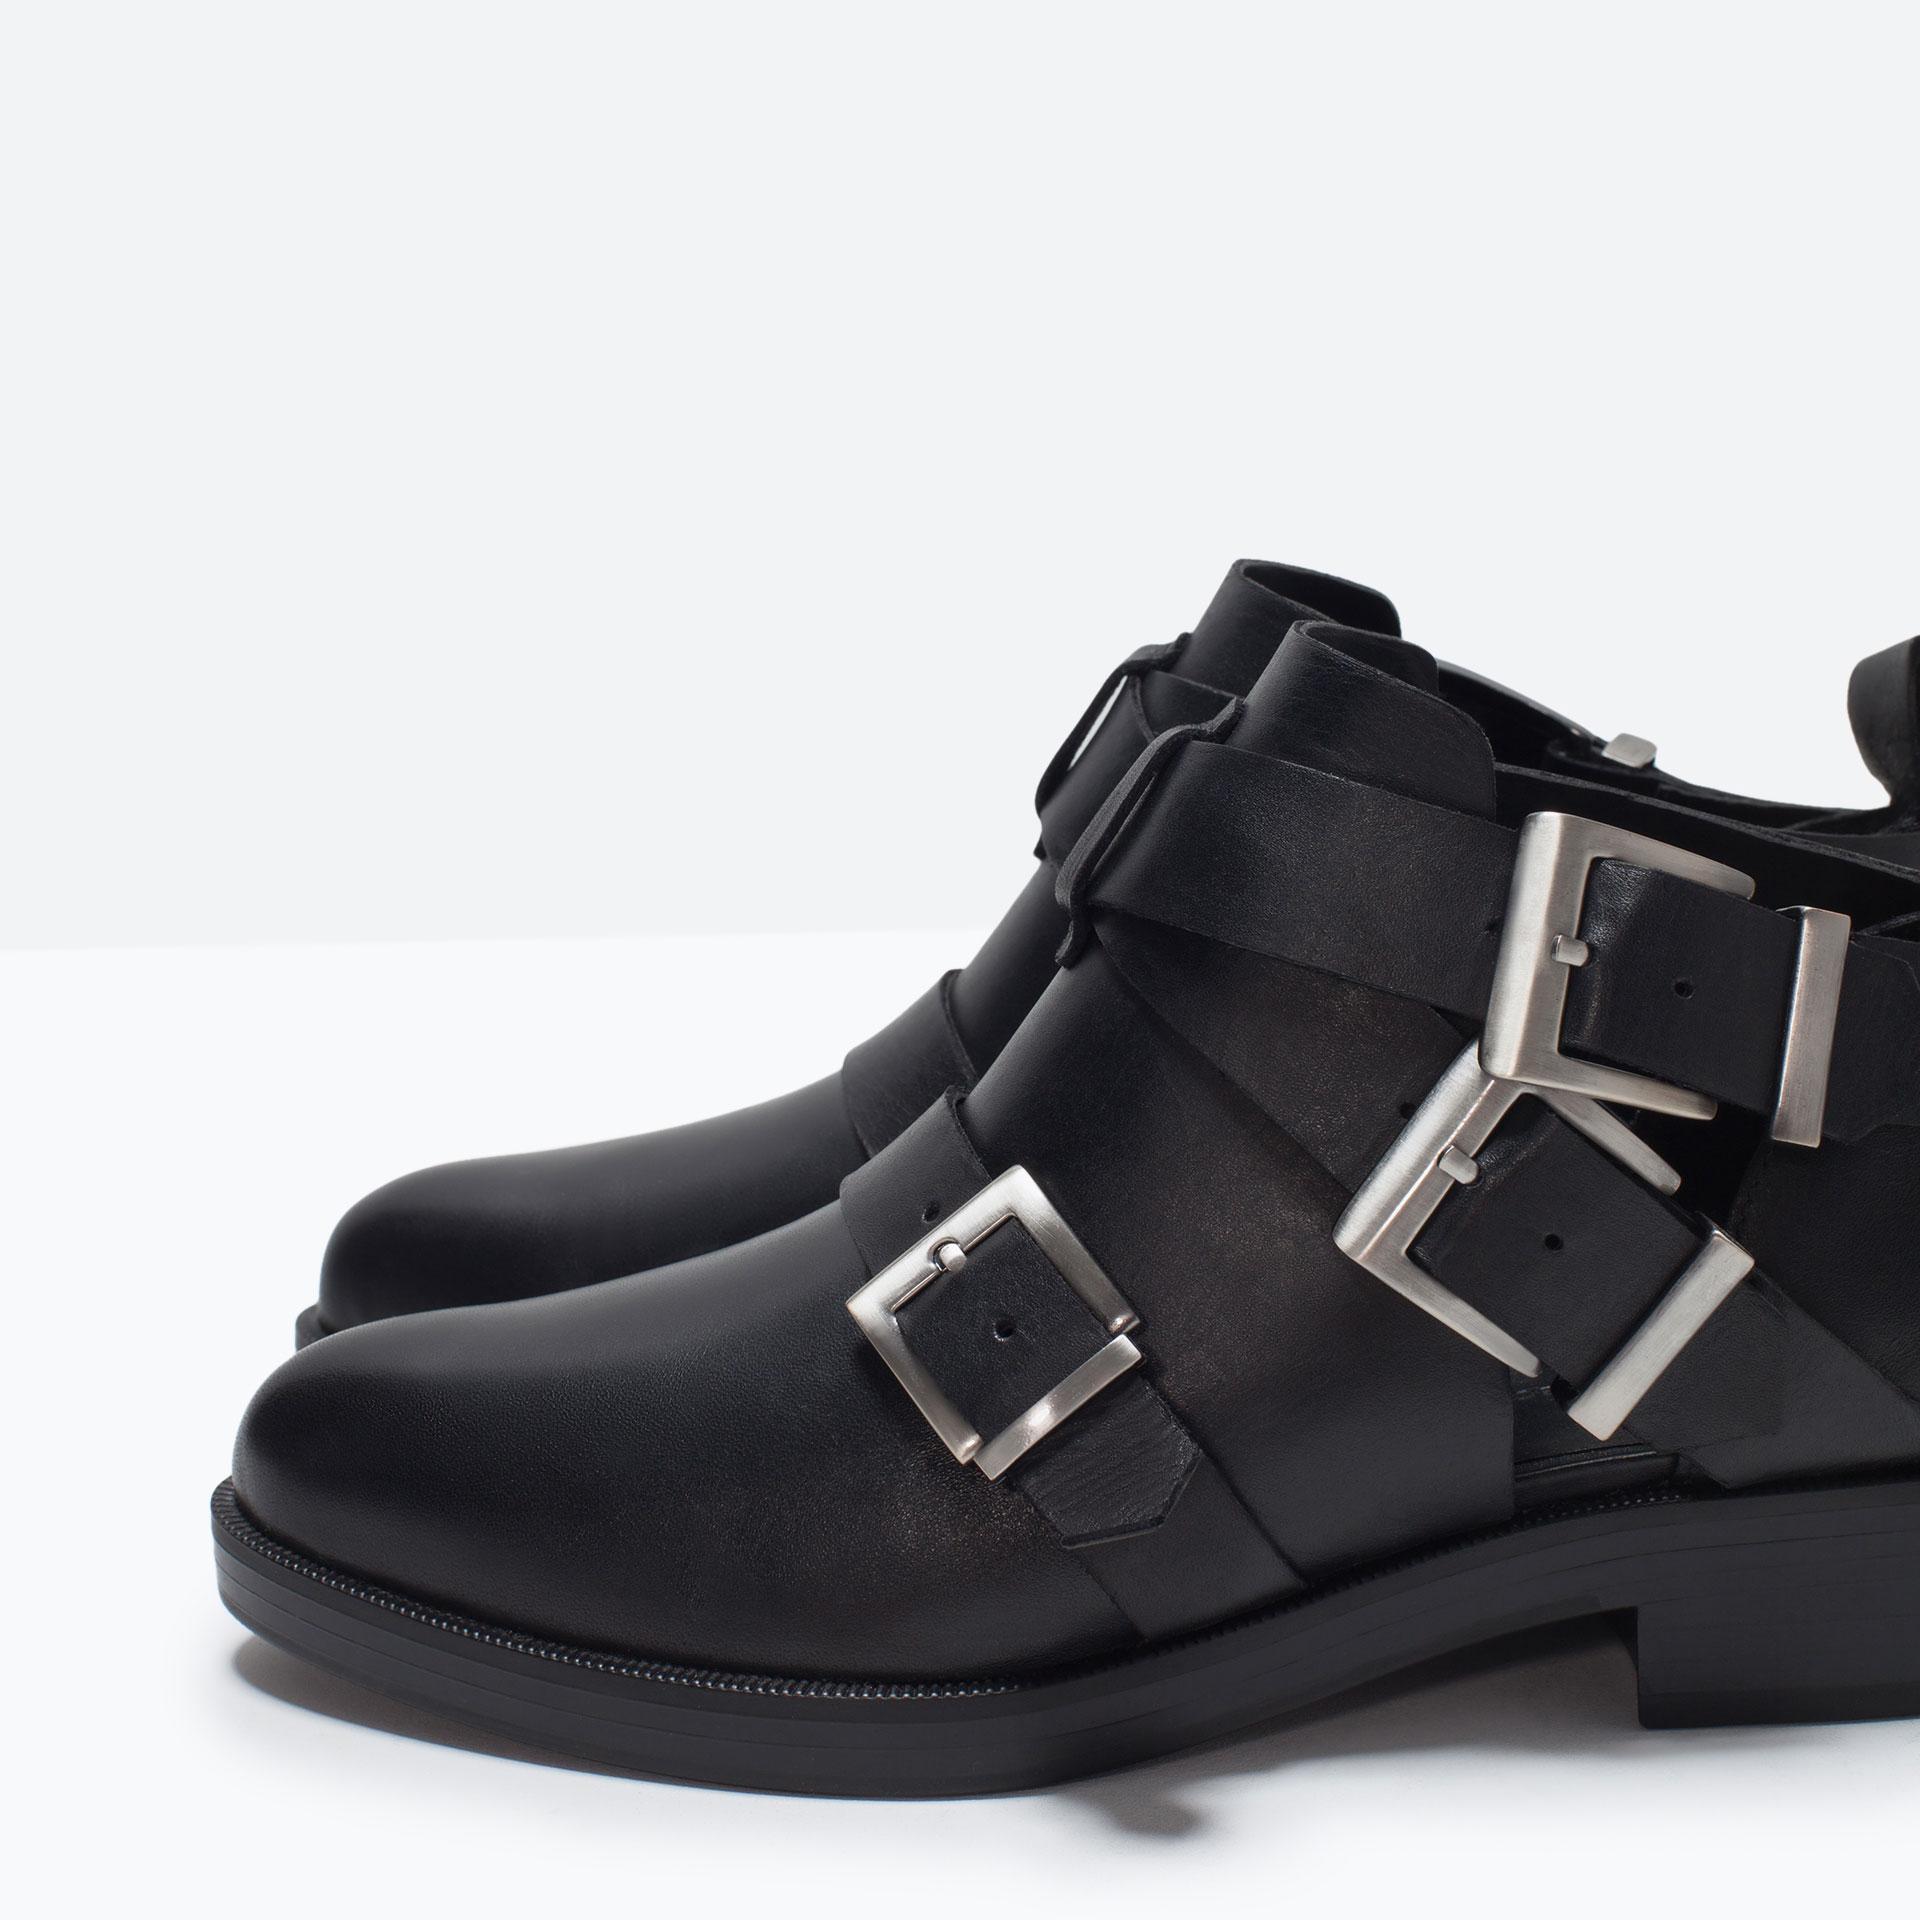 Zara Black Lace Up Shoes